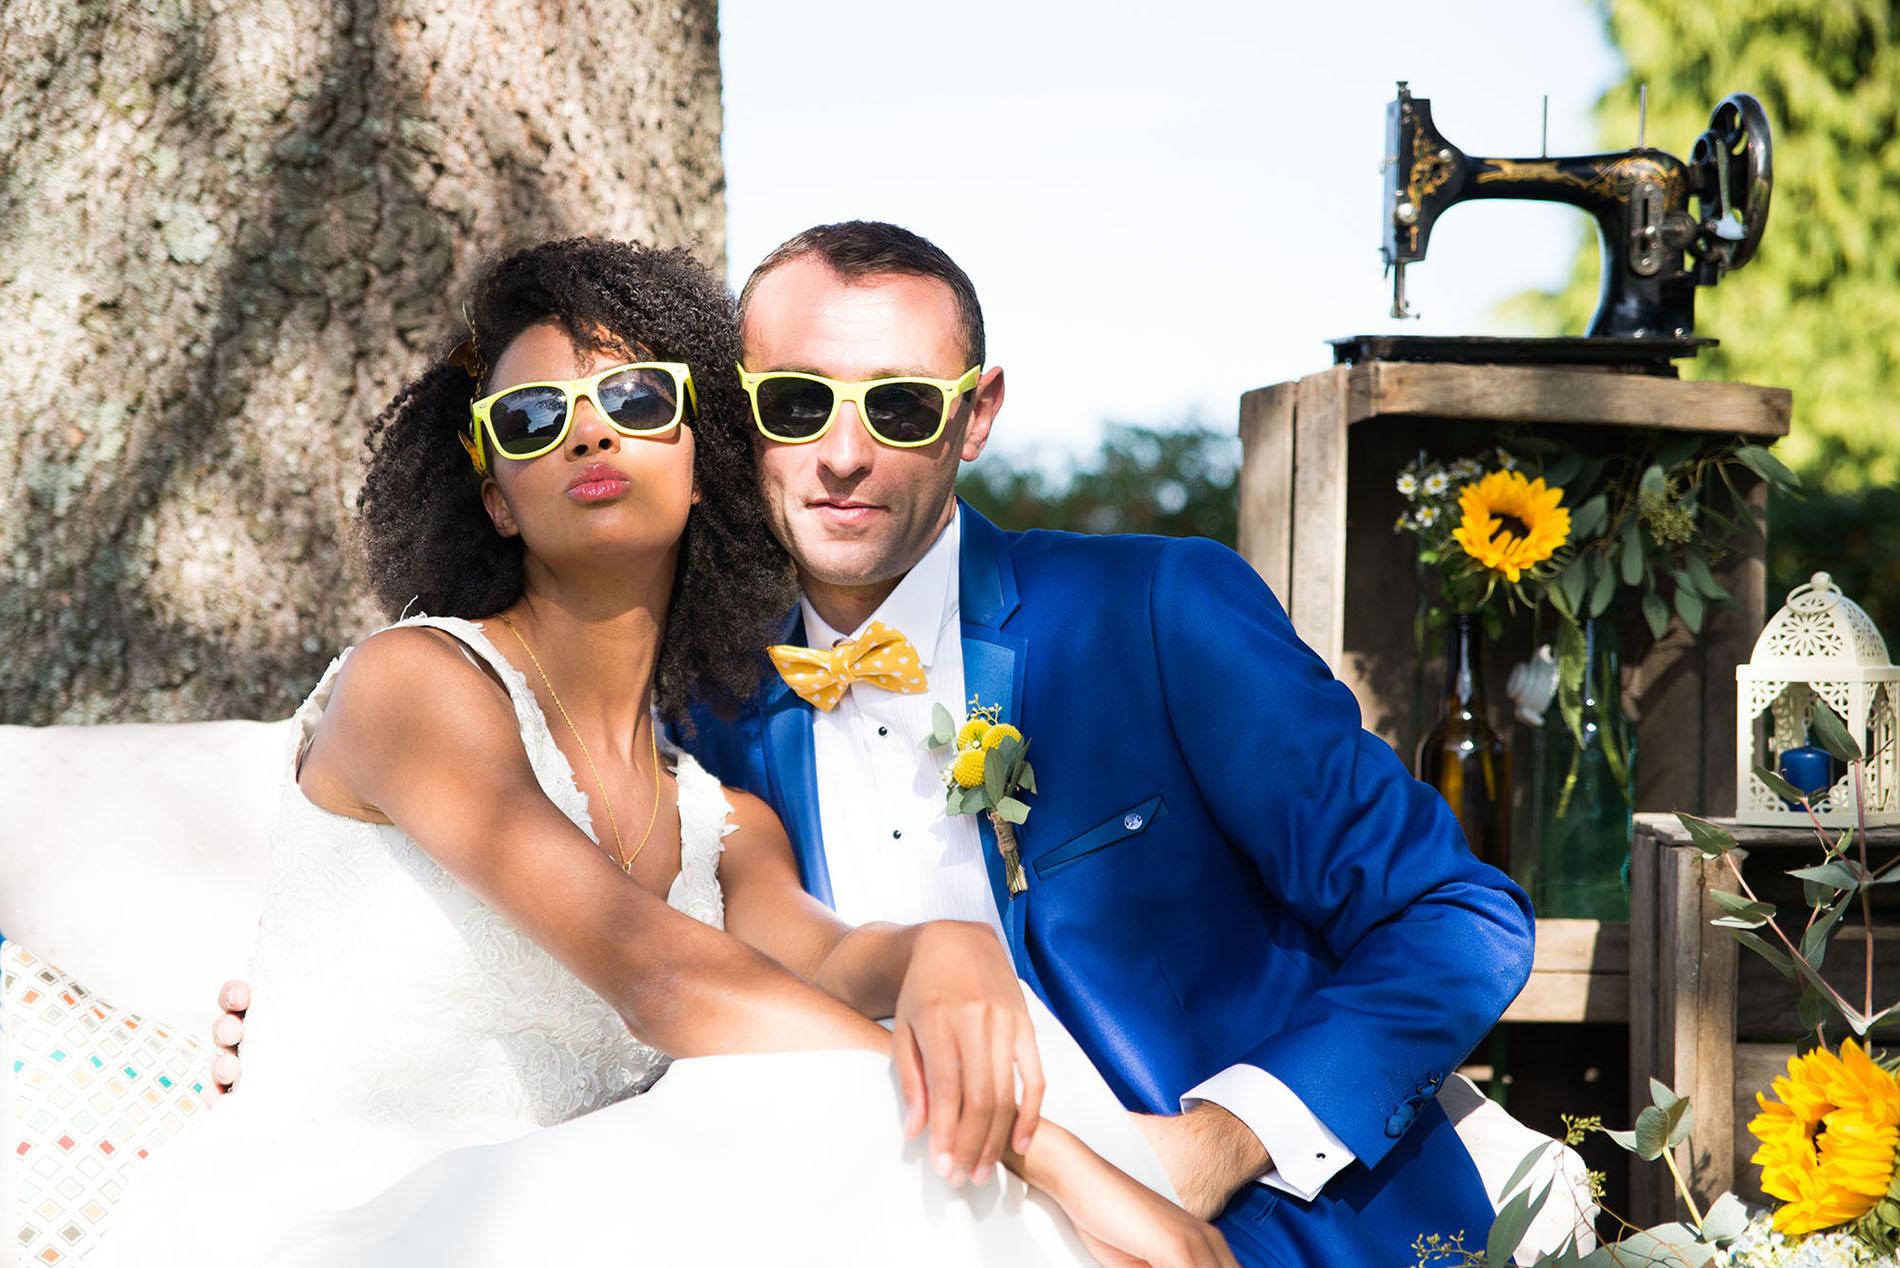 Photographe mariage limoges 64 - Mariages